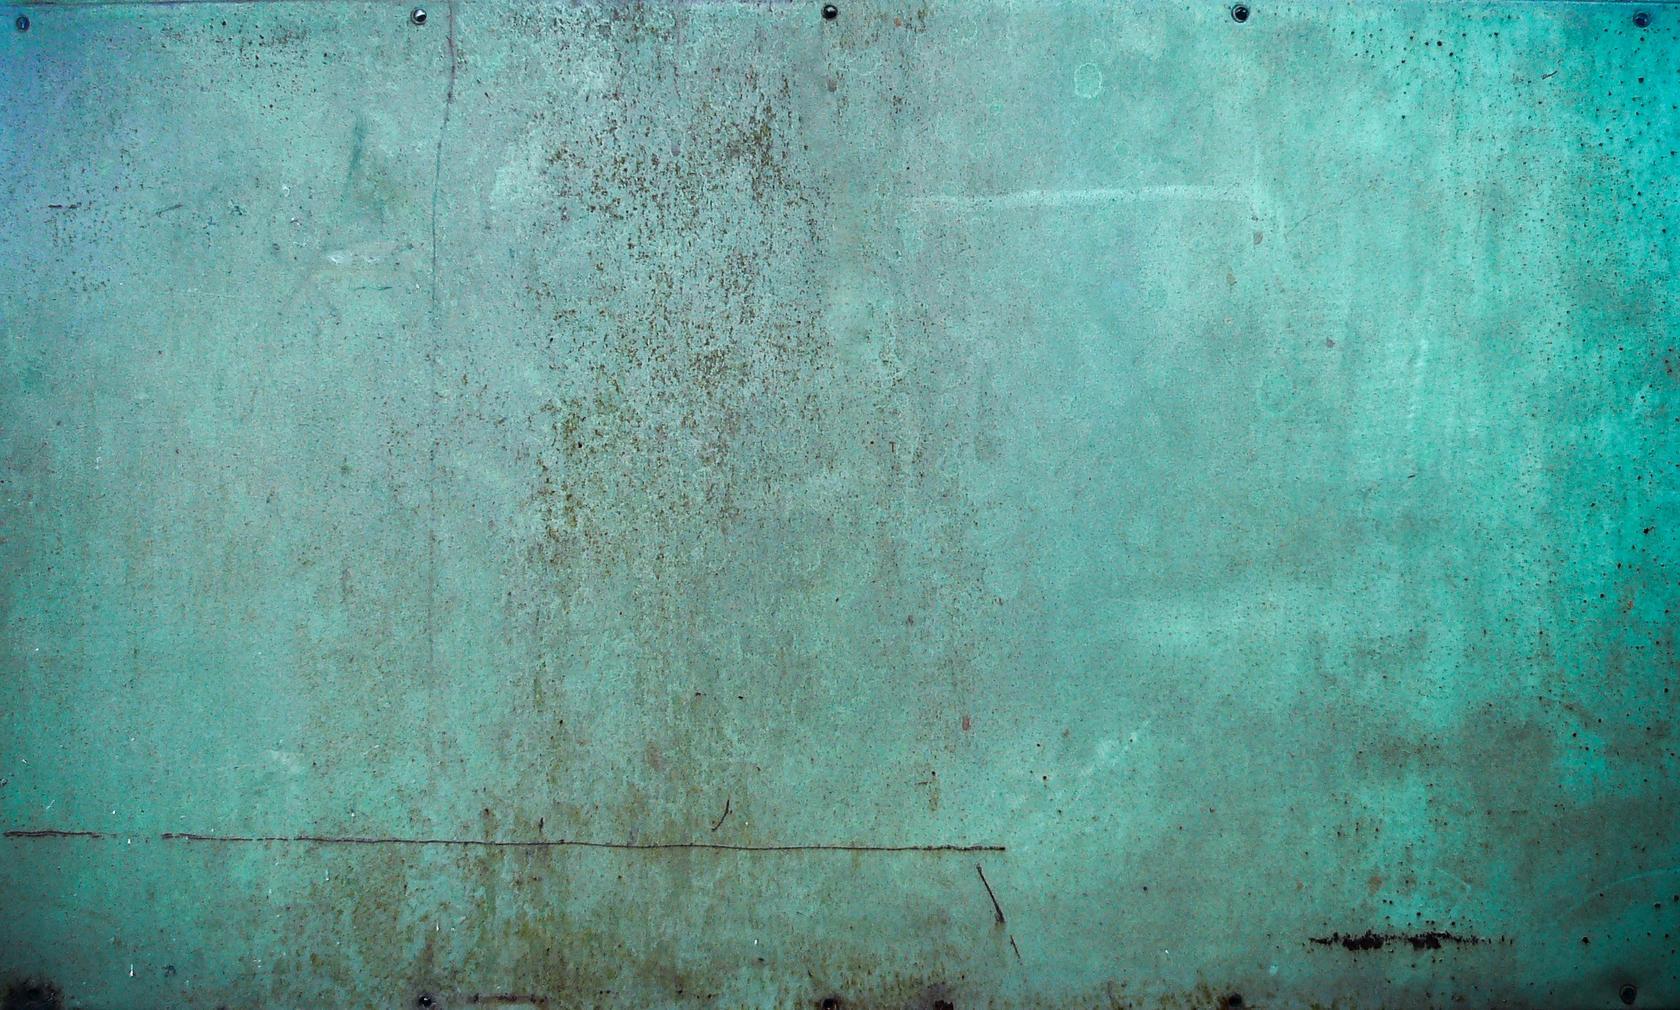 gospel music wallpaper 1280x800 - photo #34